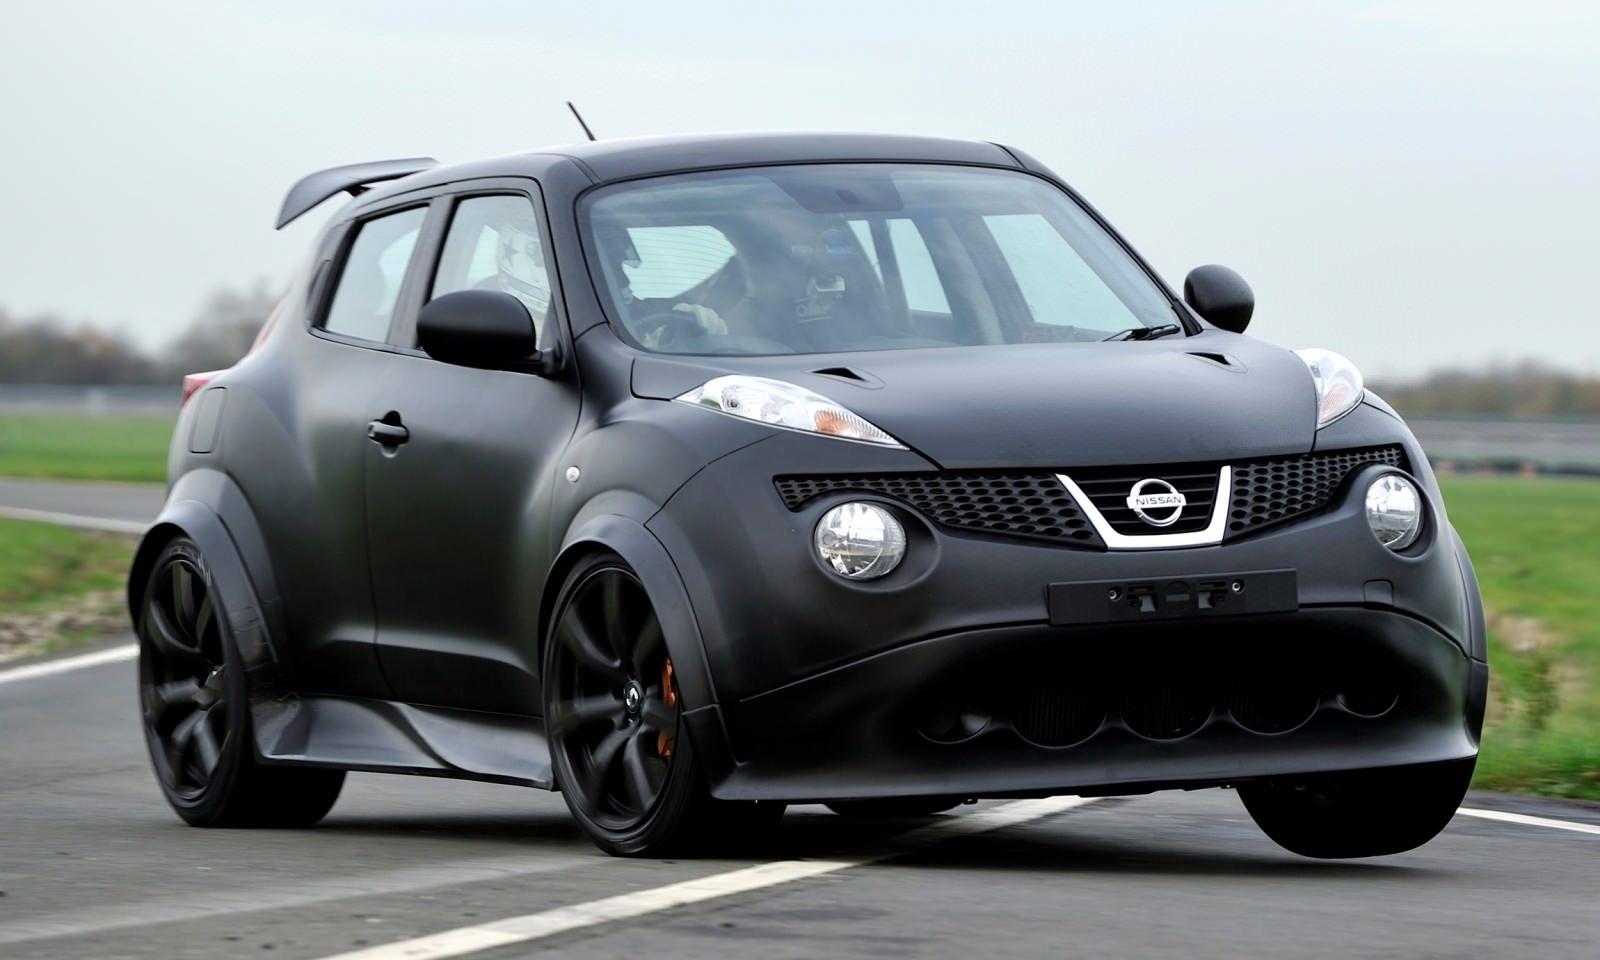 2012 Nissan JUKER Nissan juke, Nissan, Nissan motors